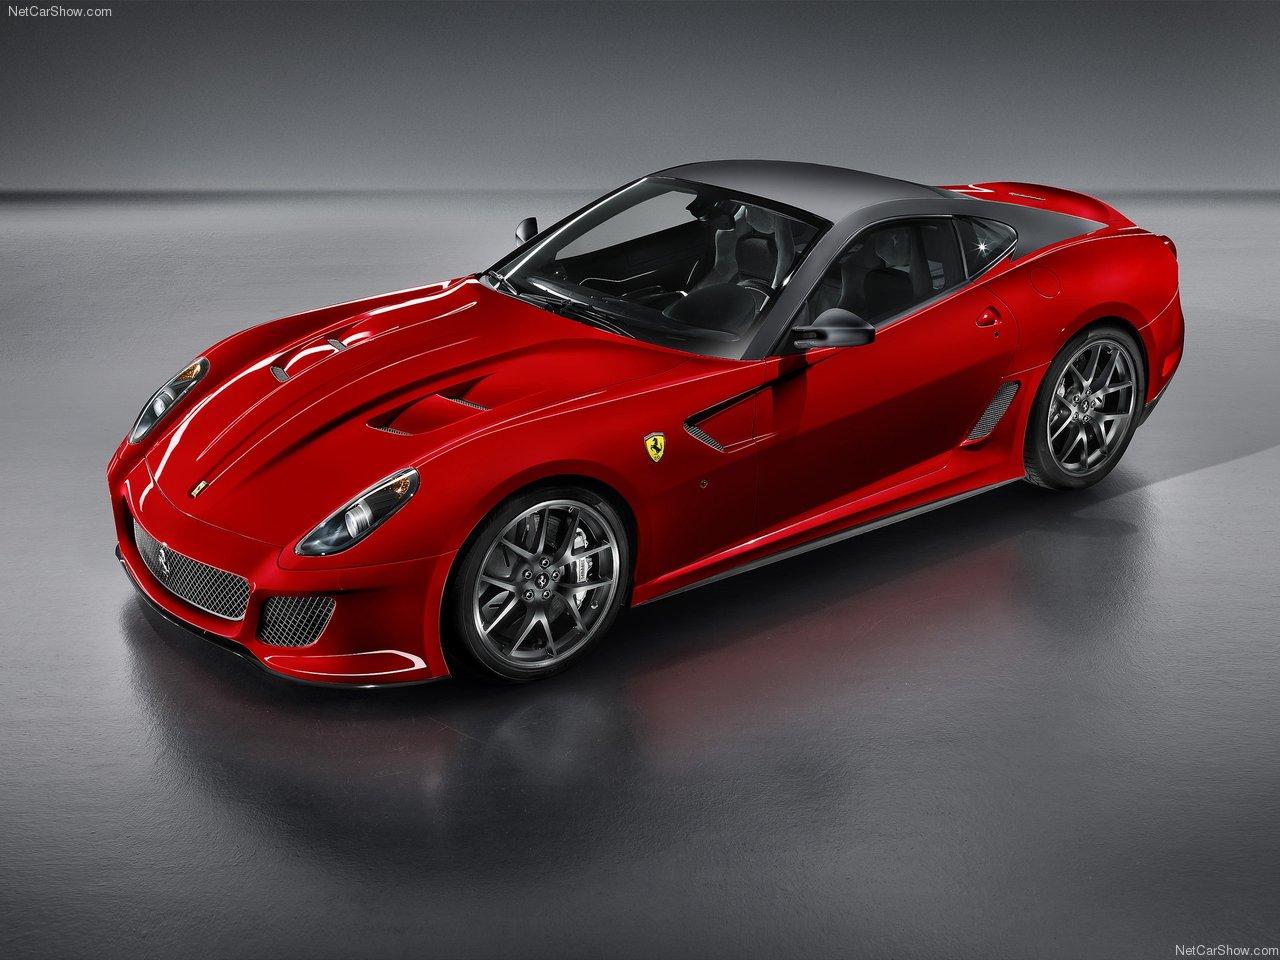 http://1.bp.blogspot.com/_cM0cwjM4pyA/S7_Mhxa0-sI/AAAAAAAAACM/Q-PfP_Bx3eE/s1600/Ferrari-599_GTO_2011_1280x960_wallpaper_01.jpg